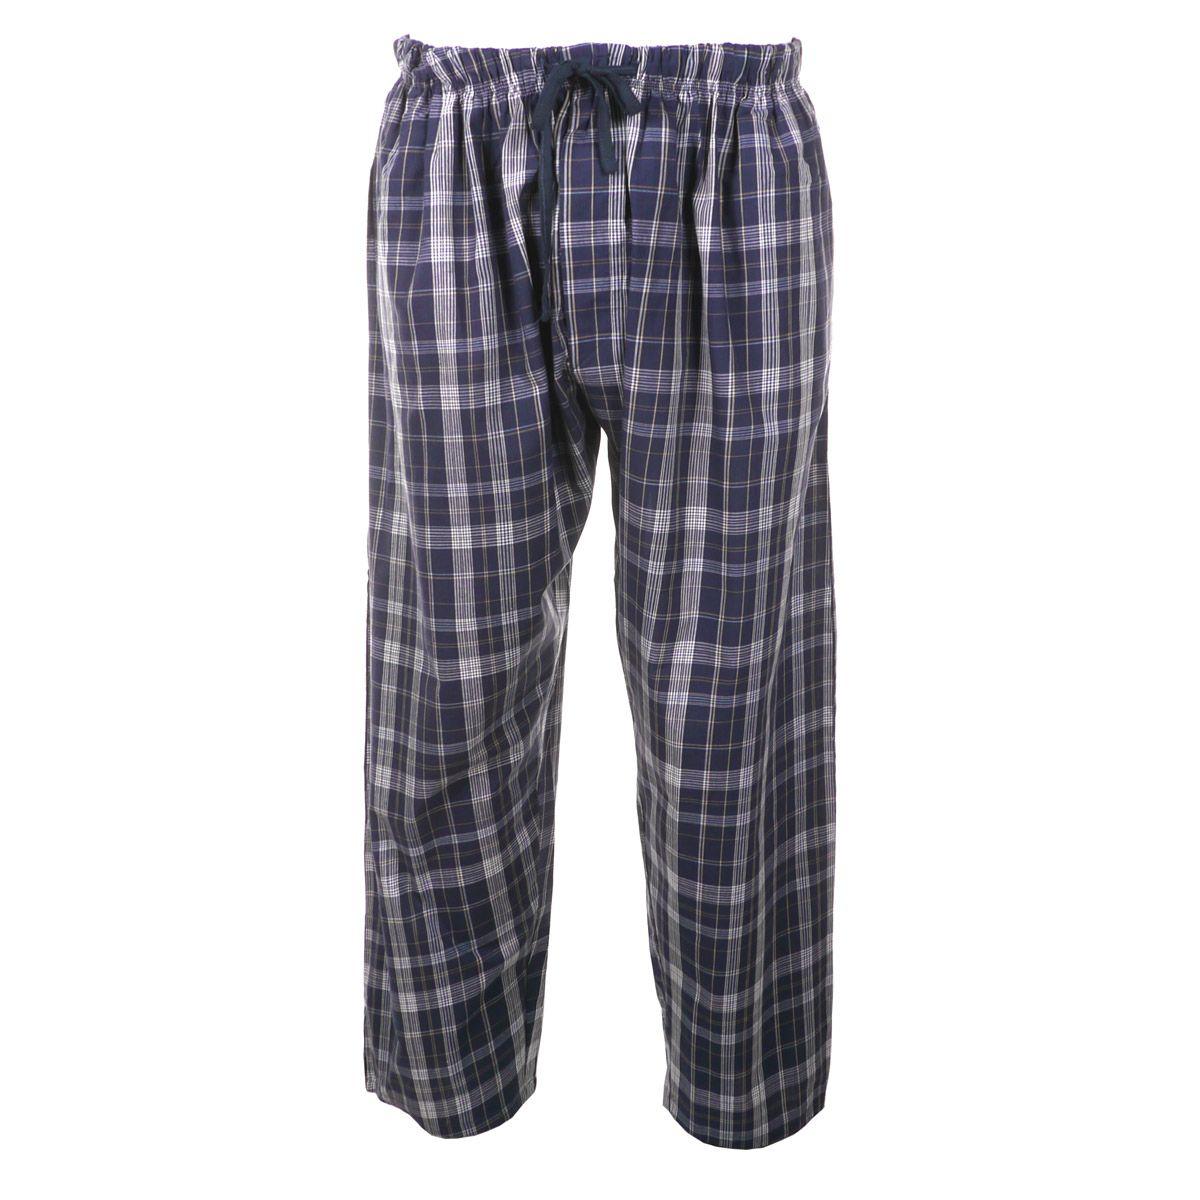 pyjama marine grande taille jusqu 39 au 6xl size factory. Black Bedroom Furniture Sets. Home Design Ideas